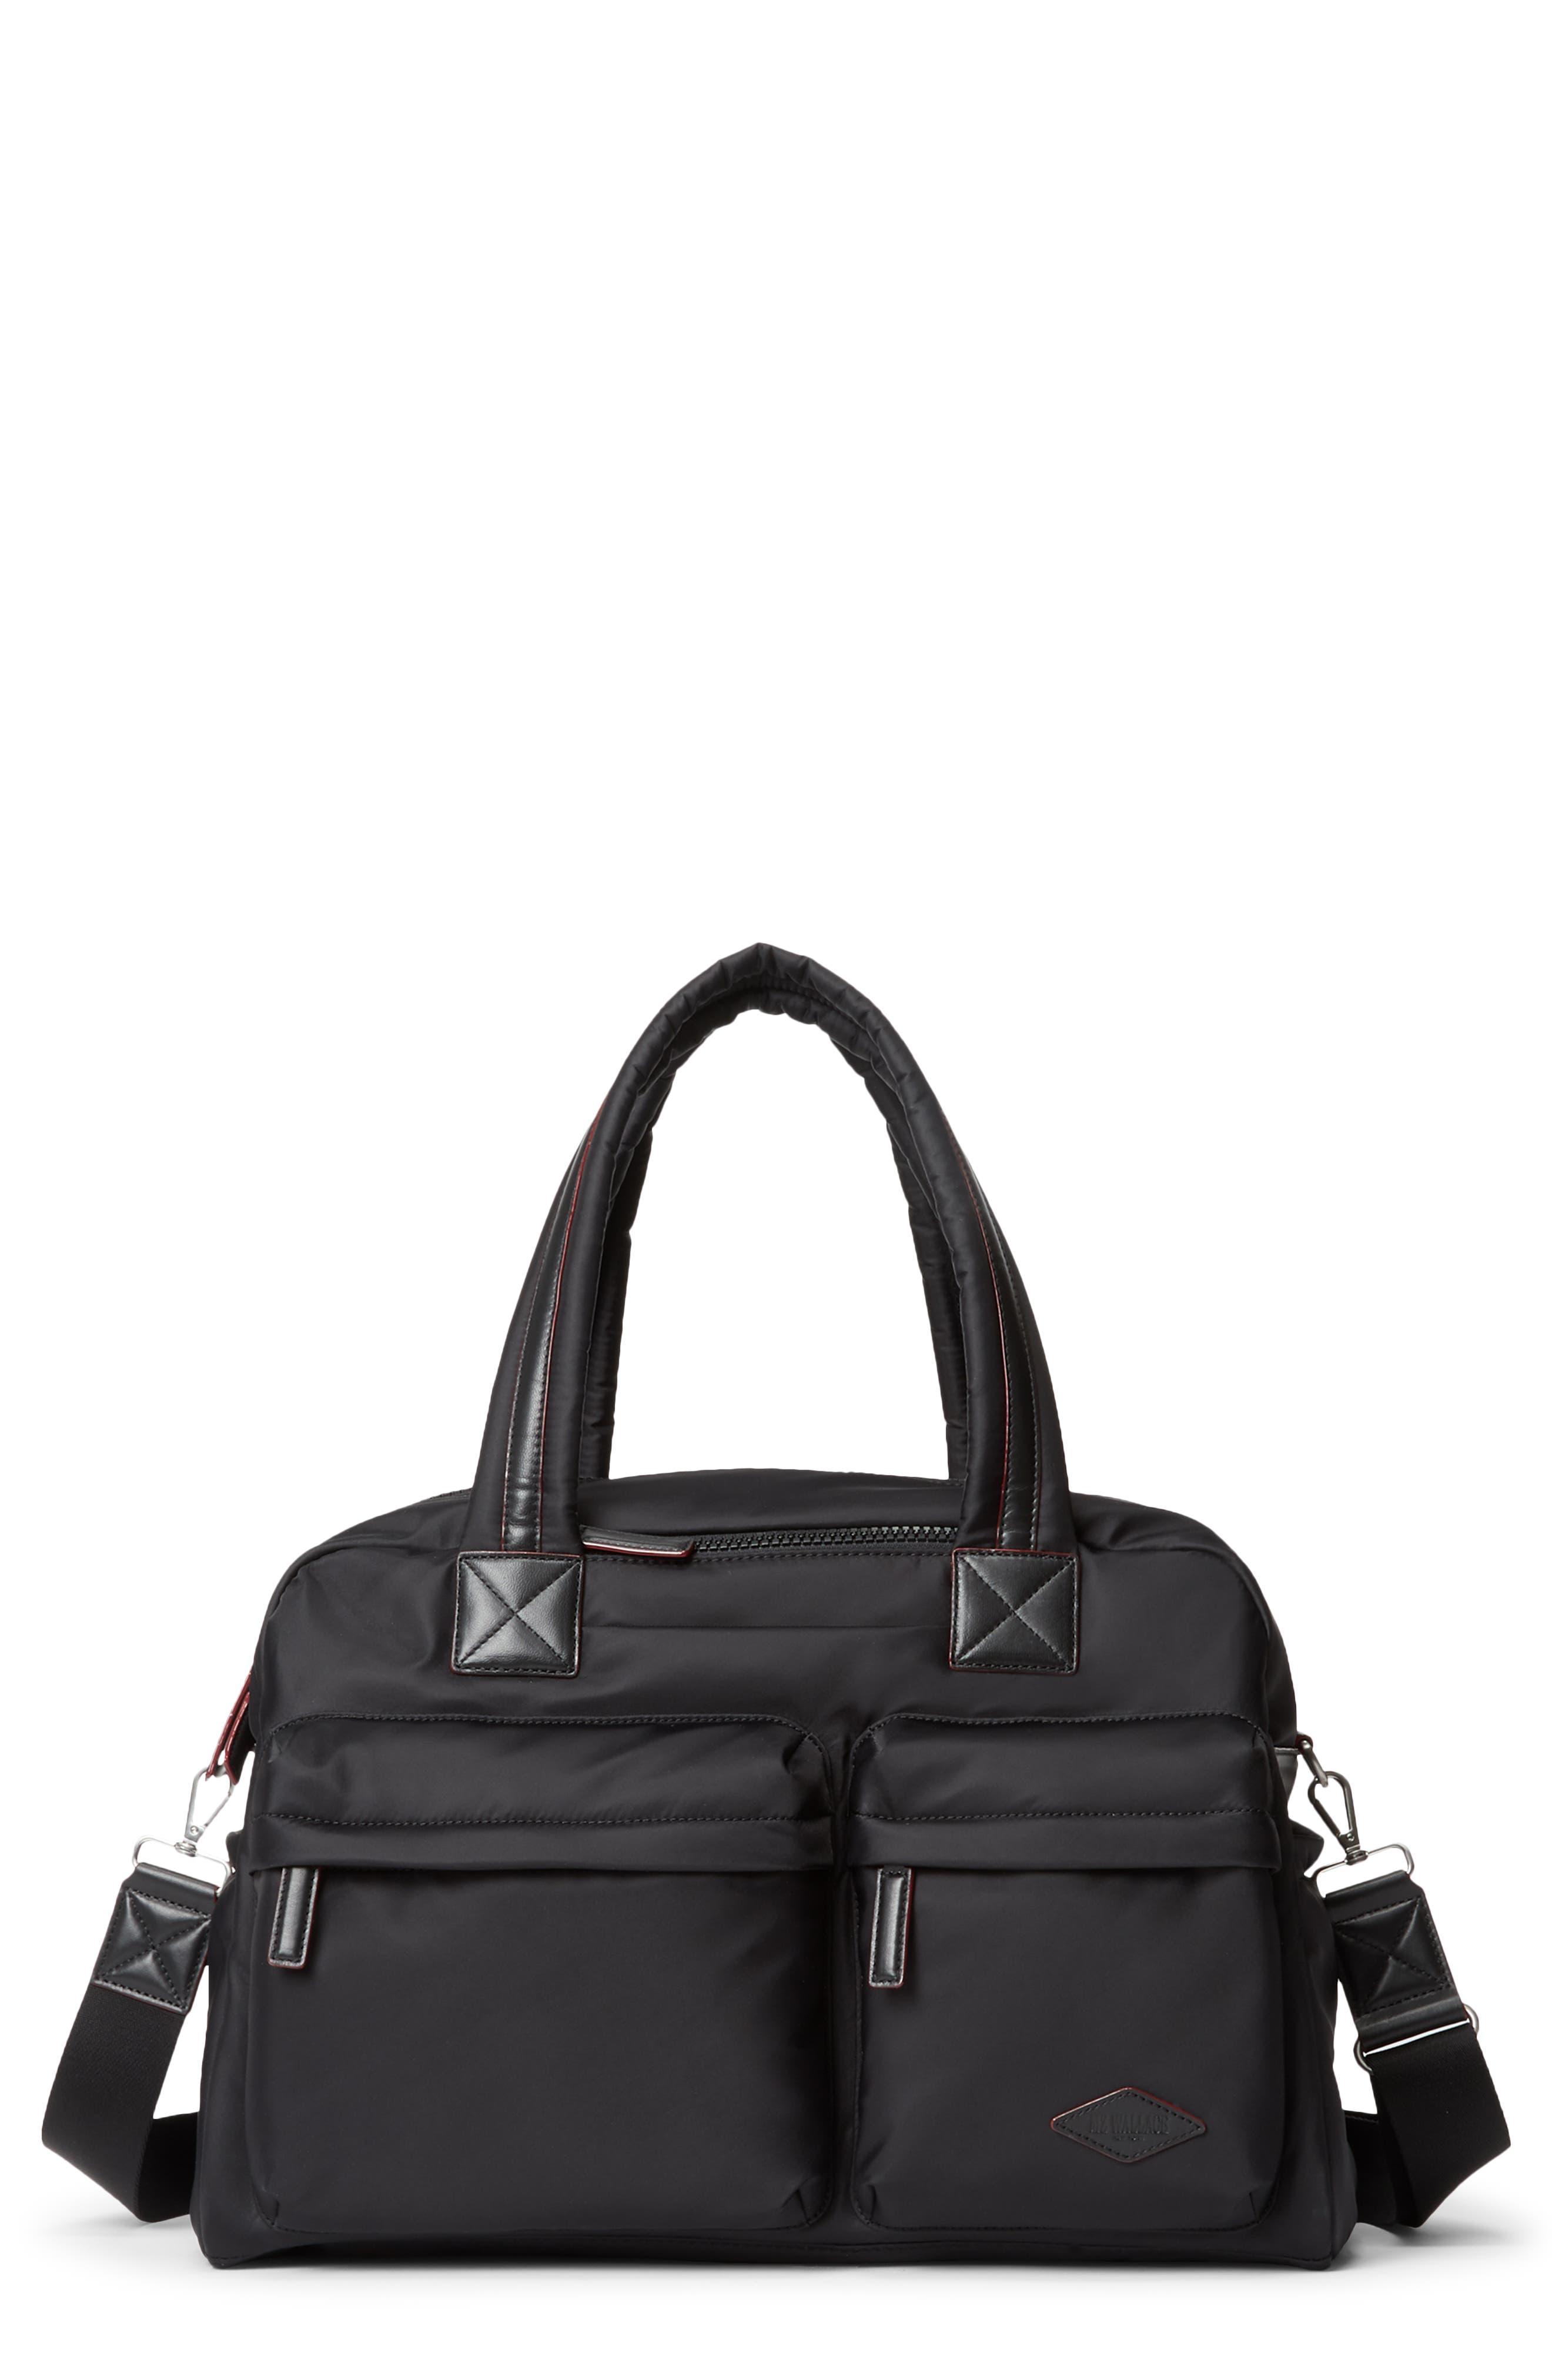 Bleecker Nylon Duffle Bag